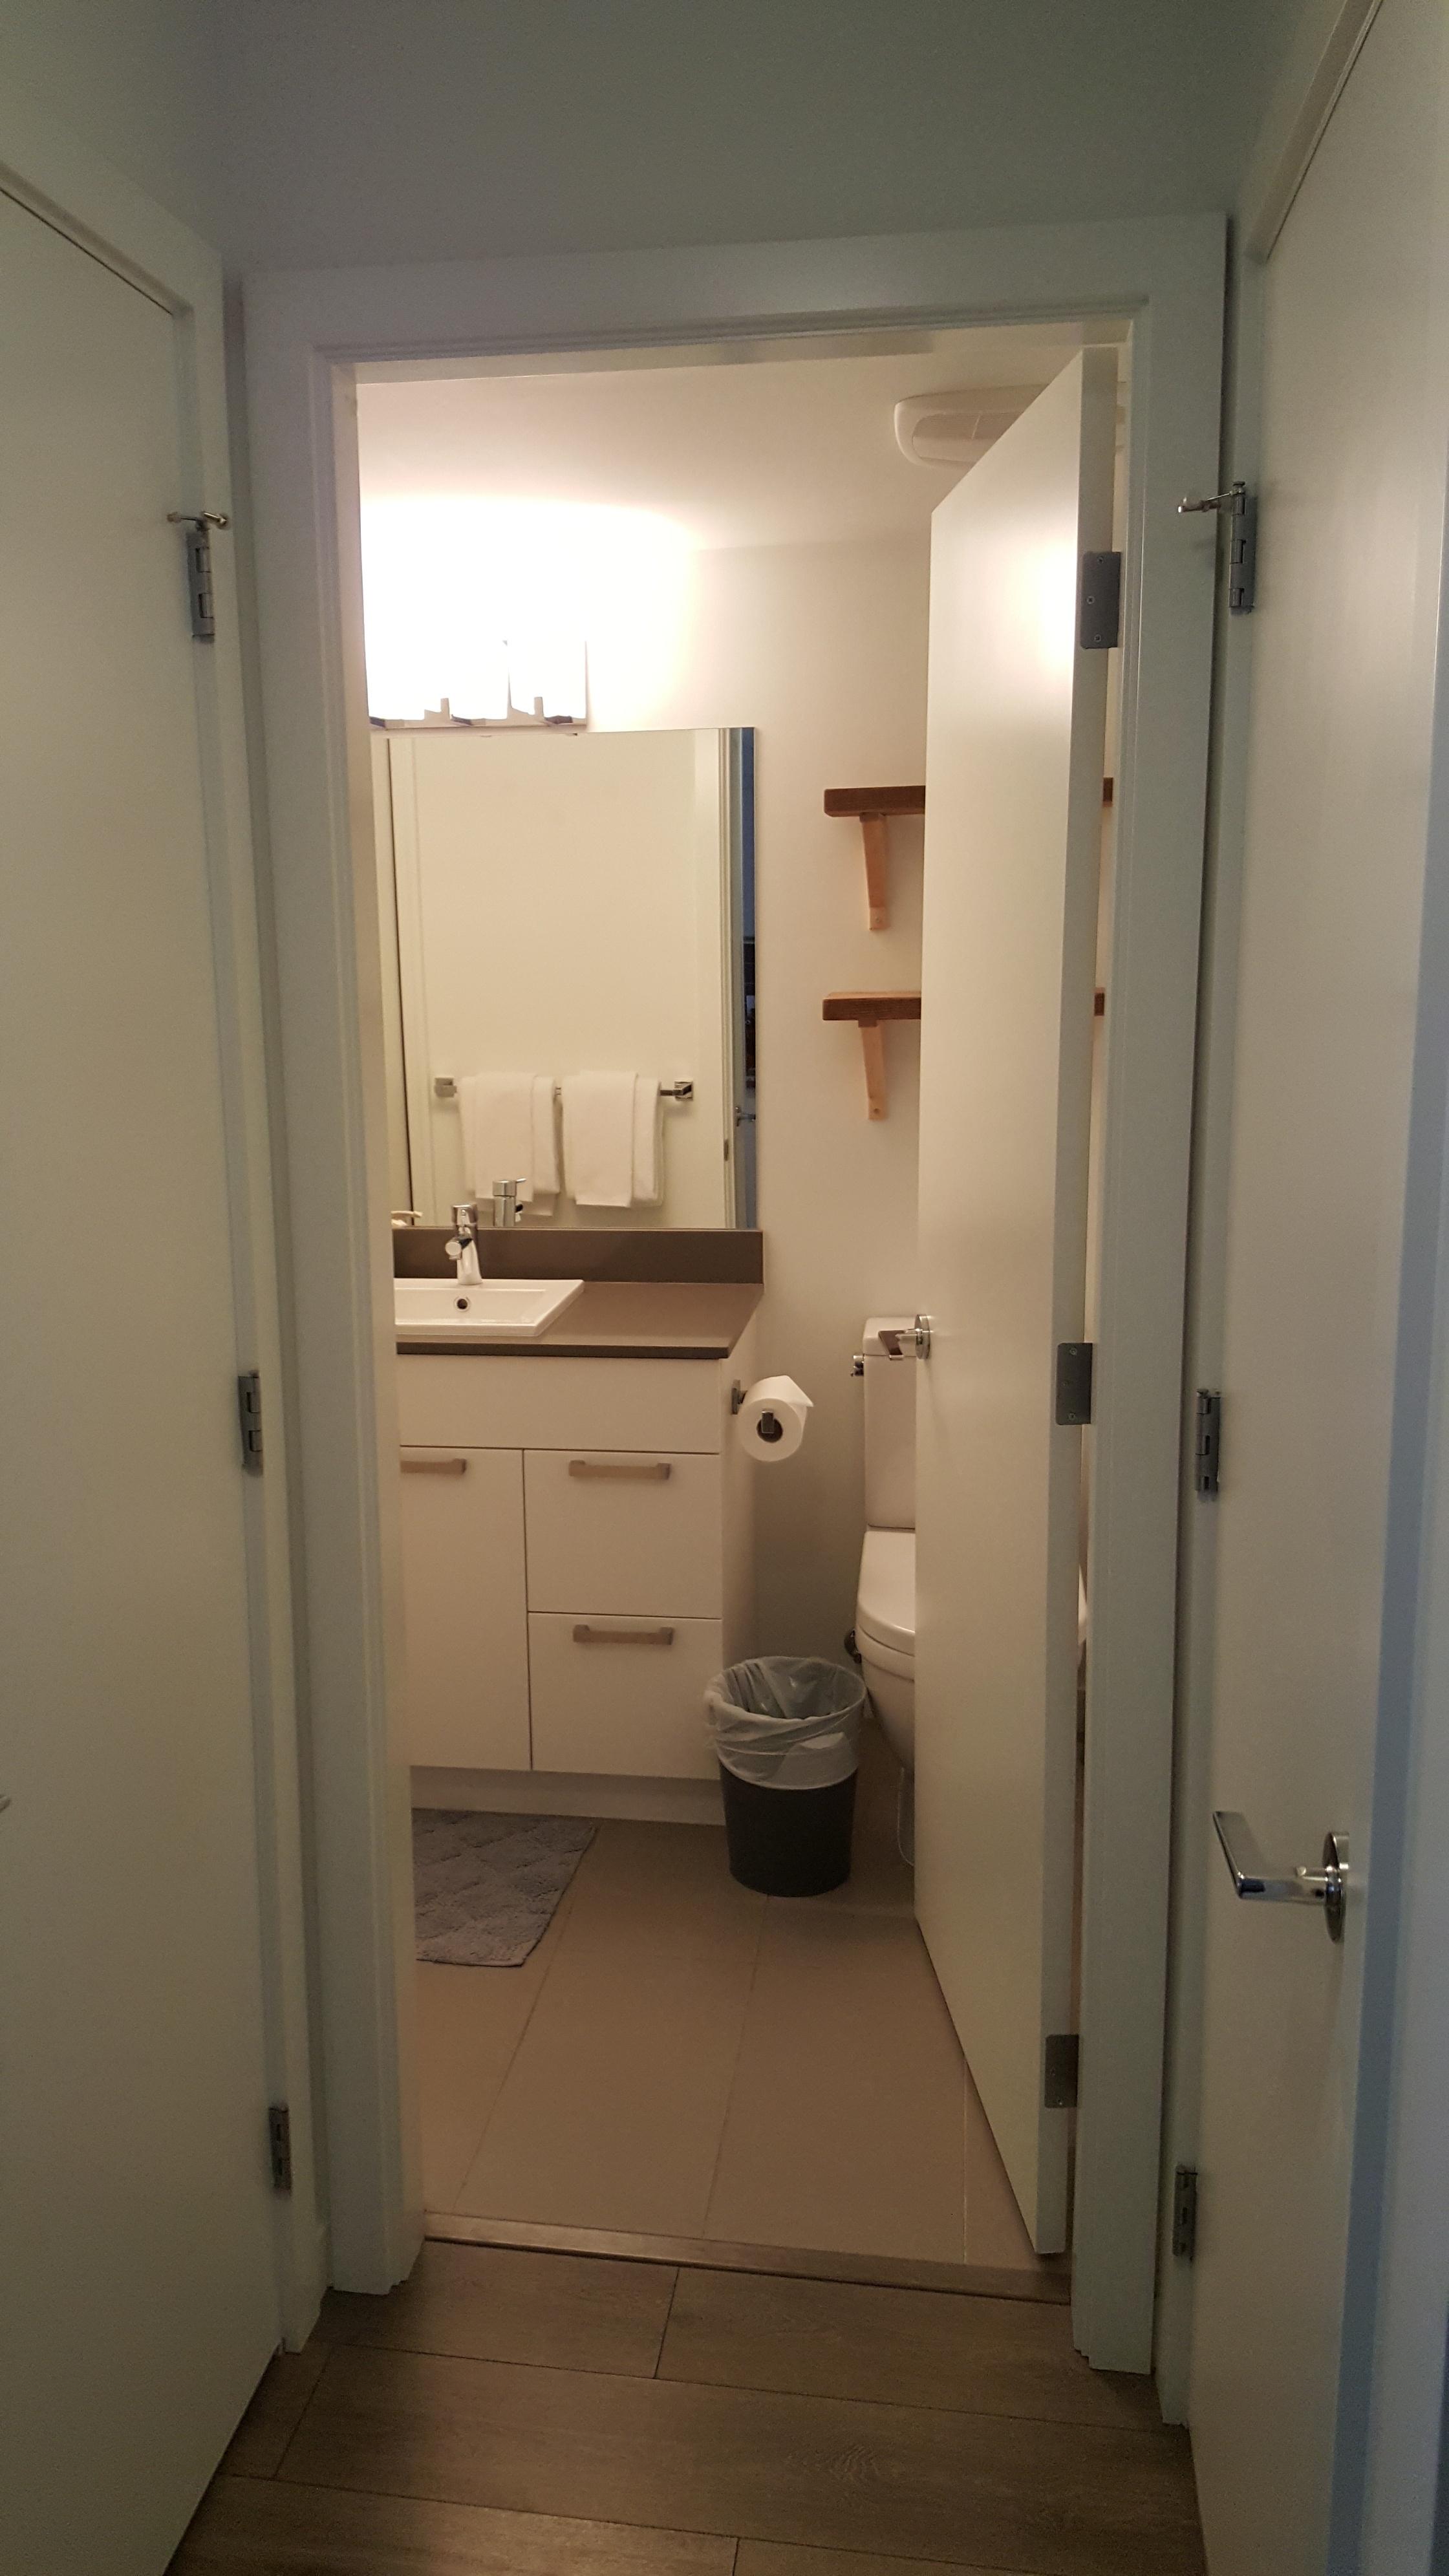 Union bathroom